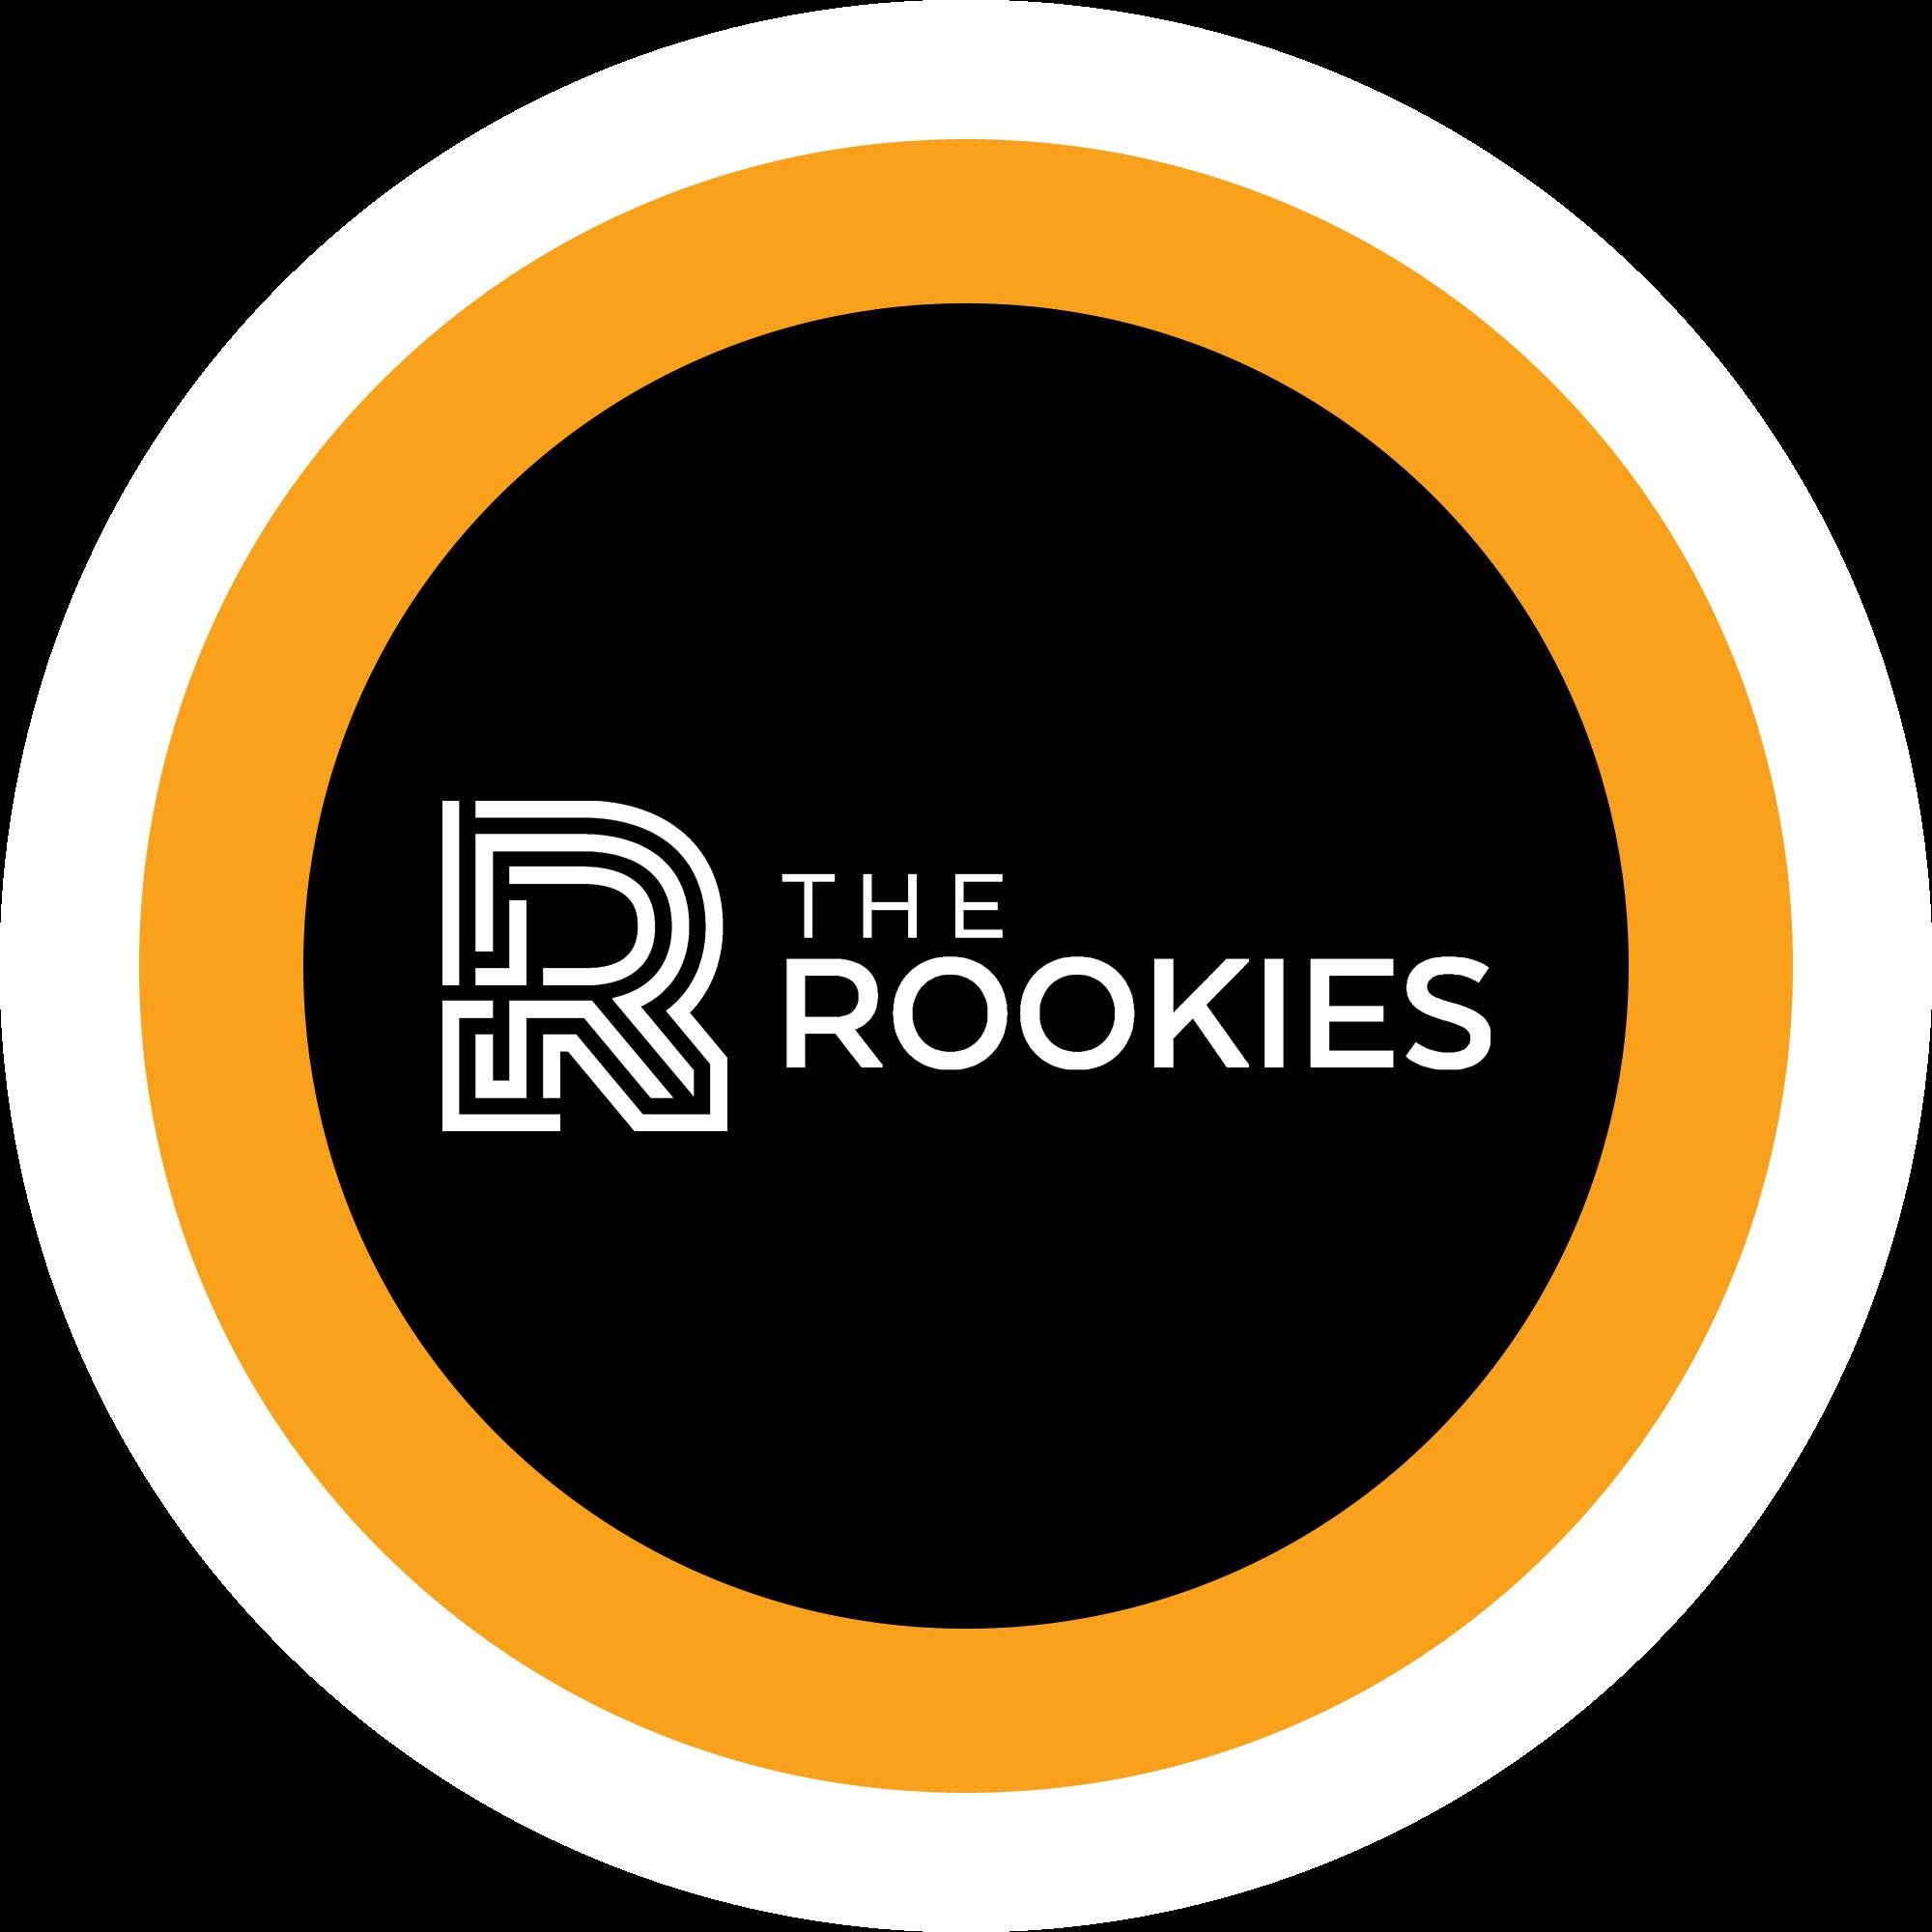 The Rookies logo